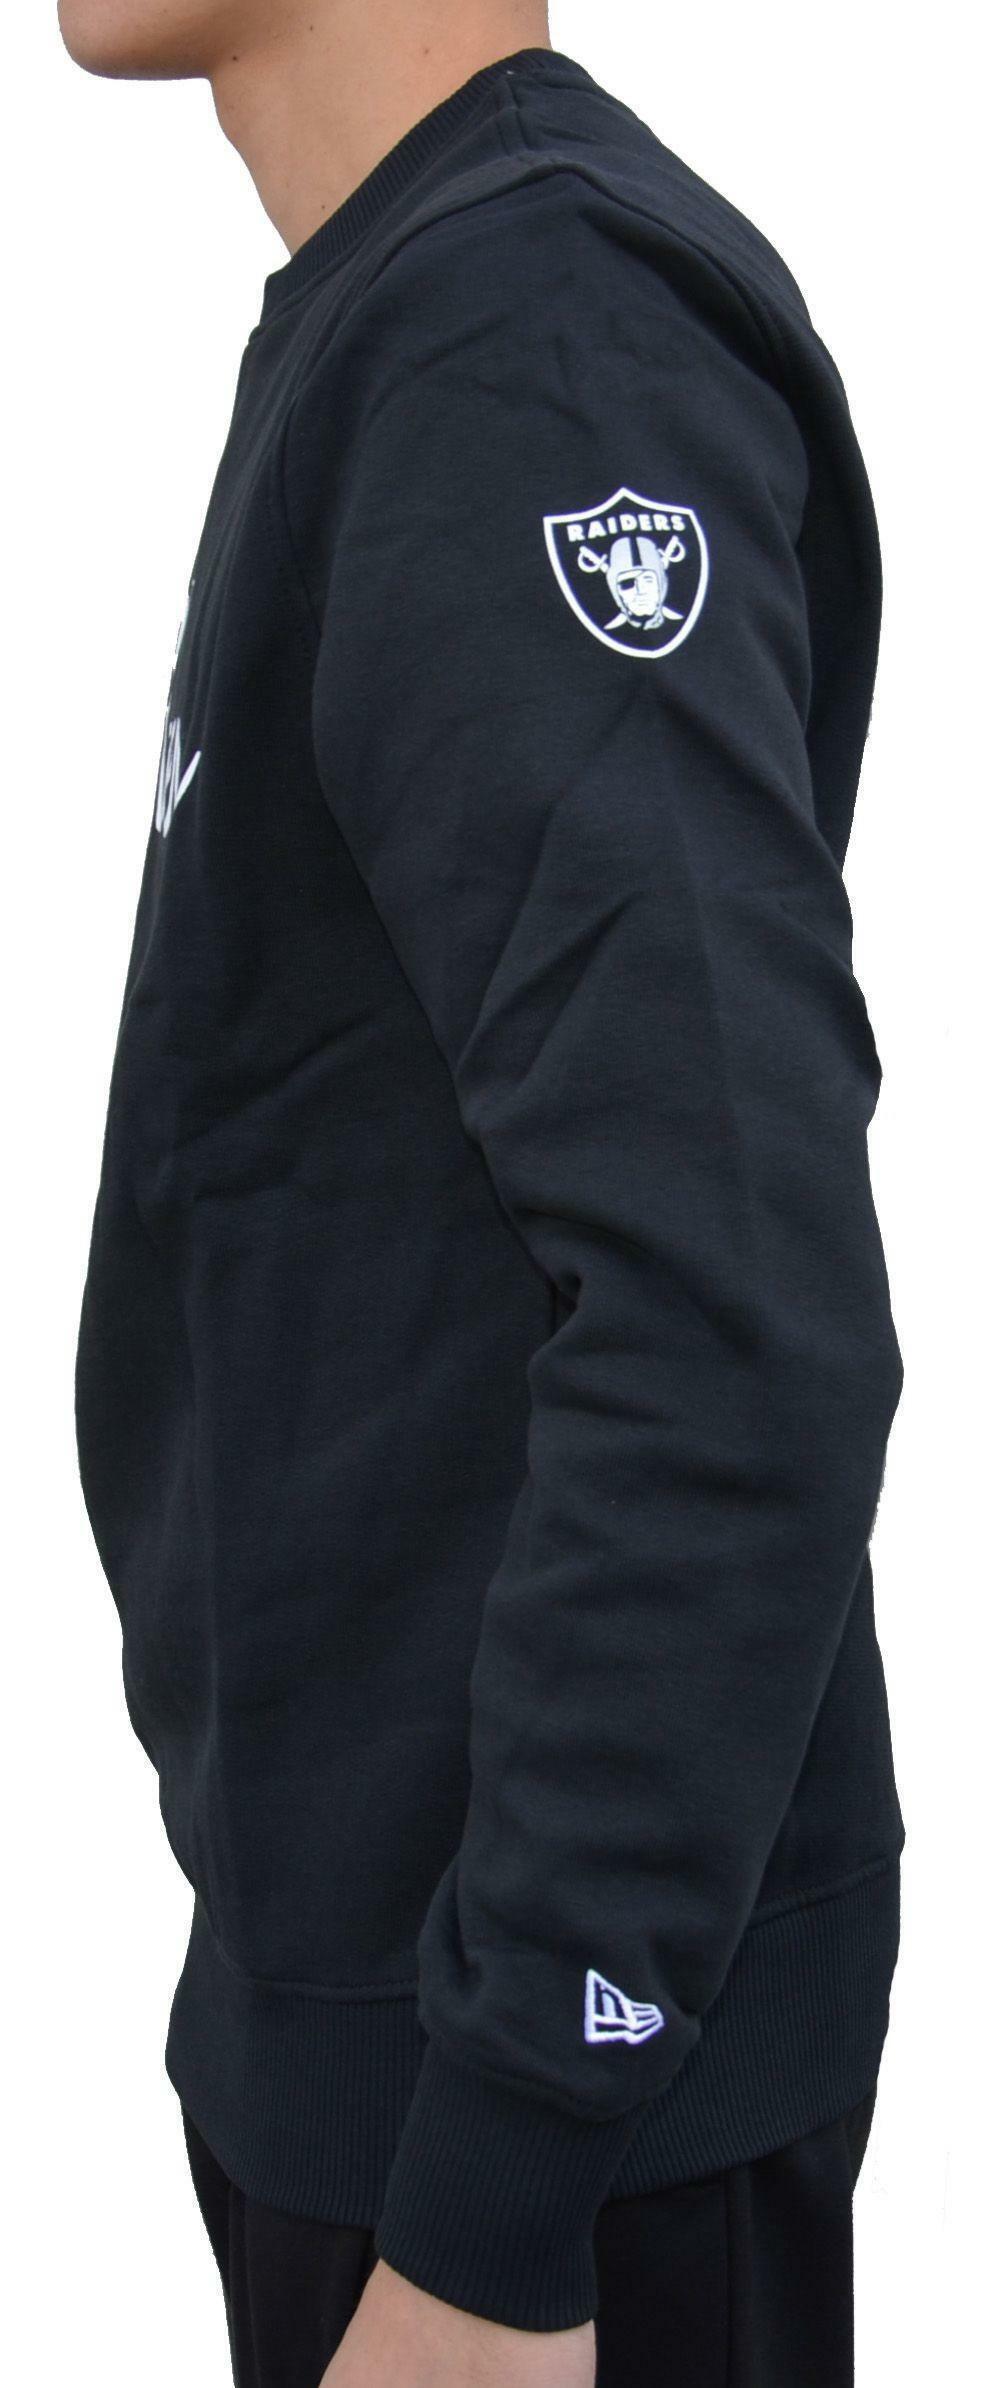 new era new era team apparel crew neck felpa uomo nera